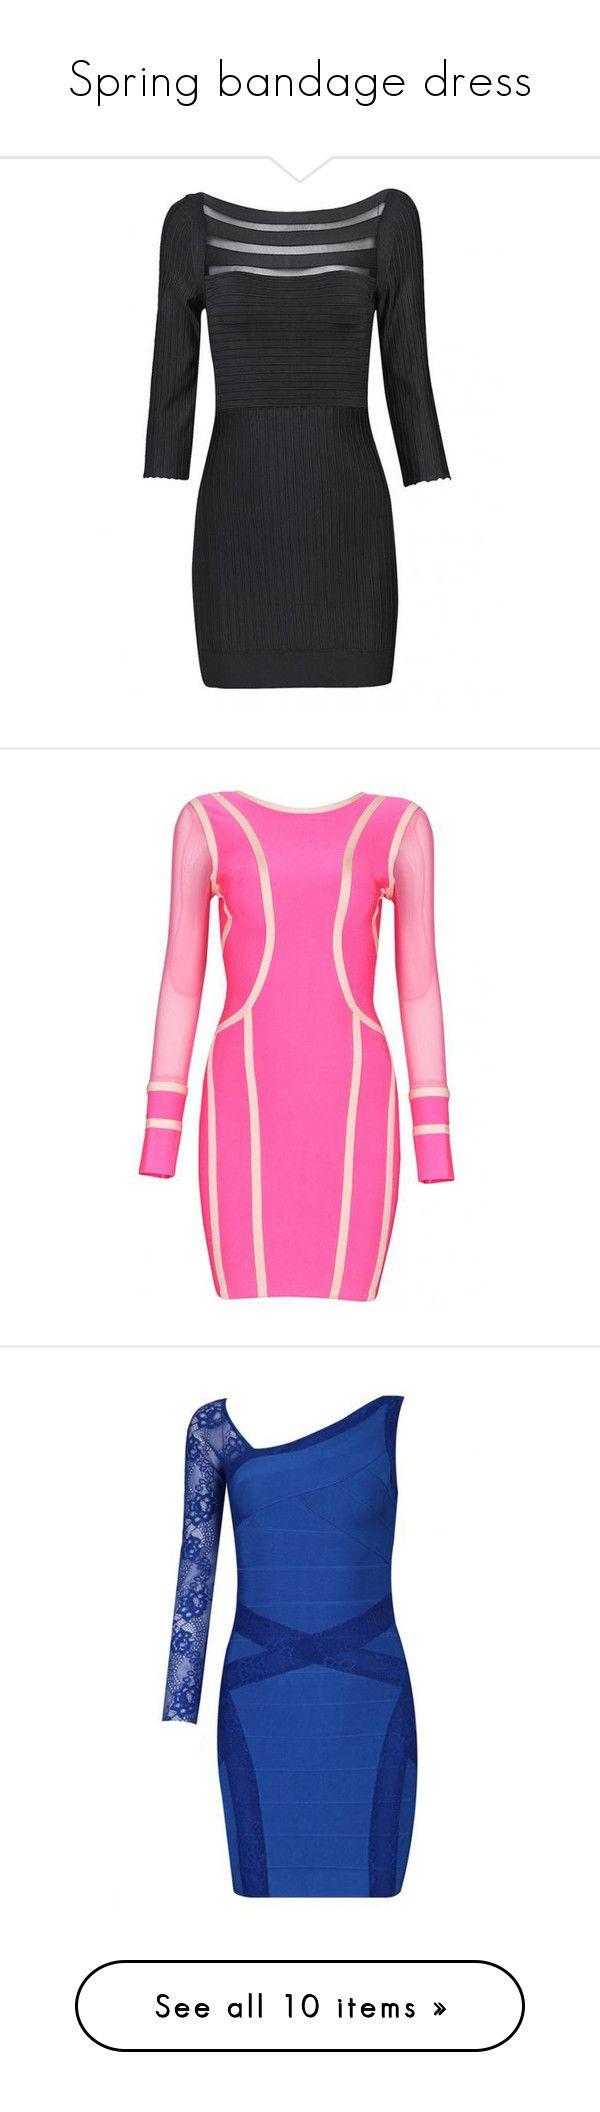 """Spring bandage dress"" by celebindress ❤ liked on Polyvore featuring dresses, striped dress, slim fit dress, slim fitting dresses, long sleeve striped dress, longsleeve dress, long sleeve day dresses, pink long sleeve dress, long sleeve bandage dress and pink mesh dress"